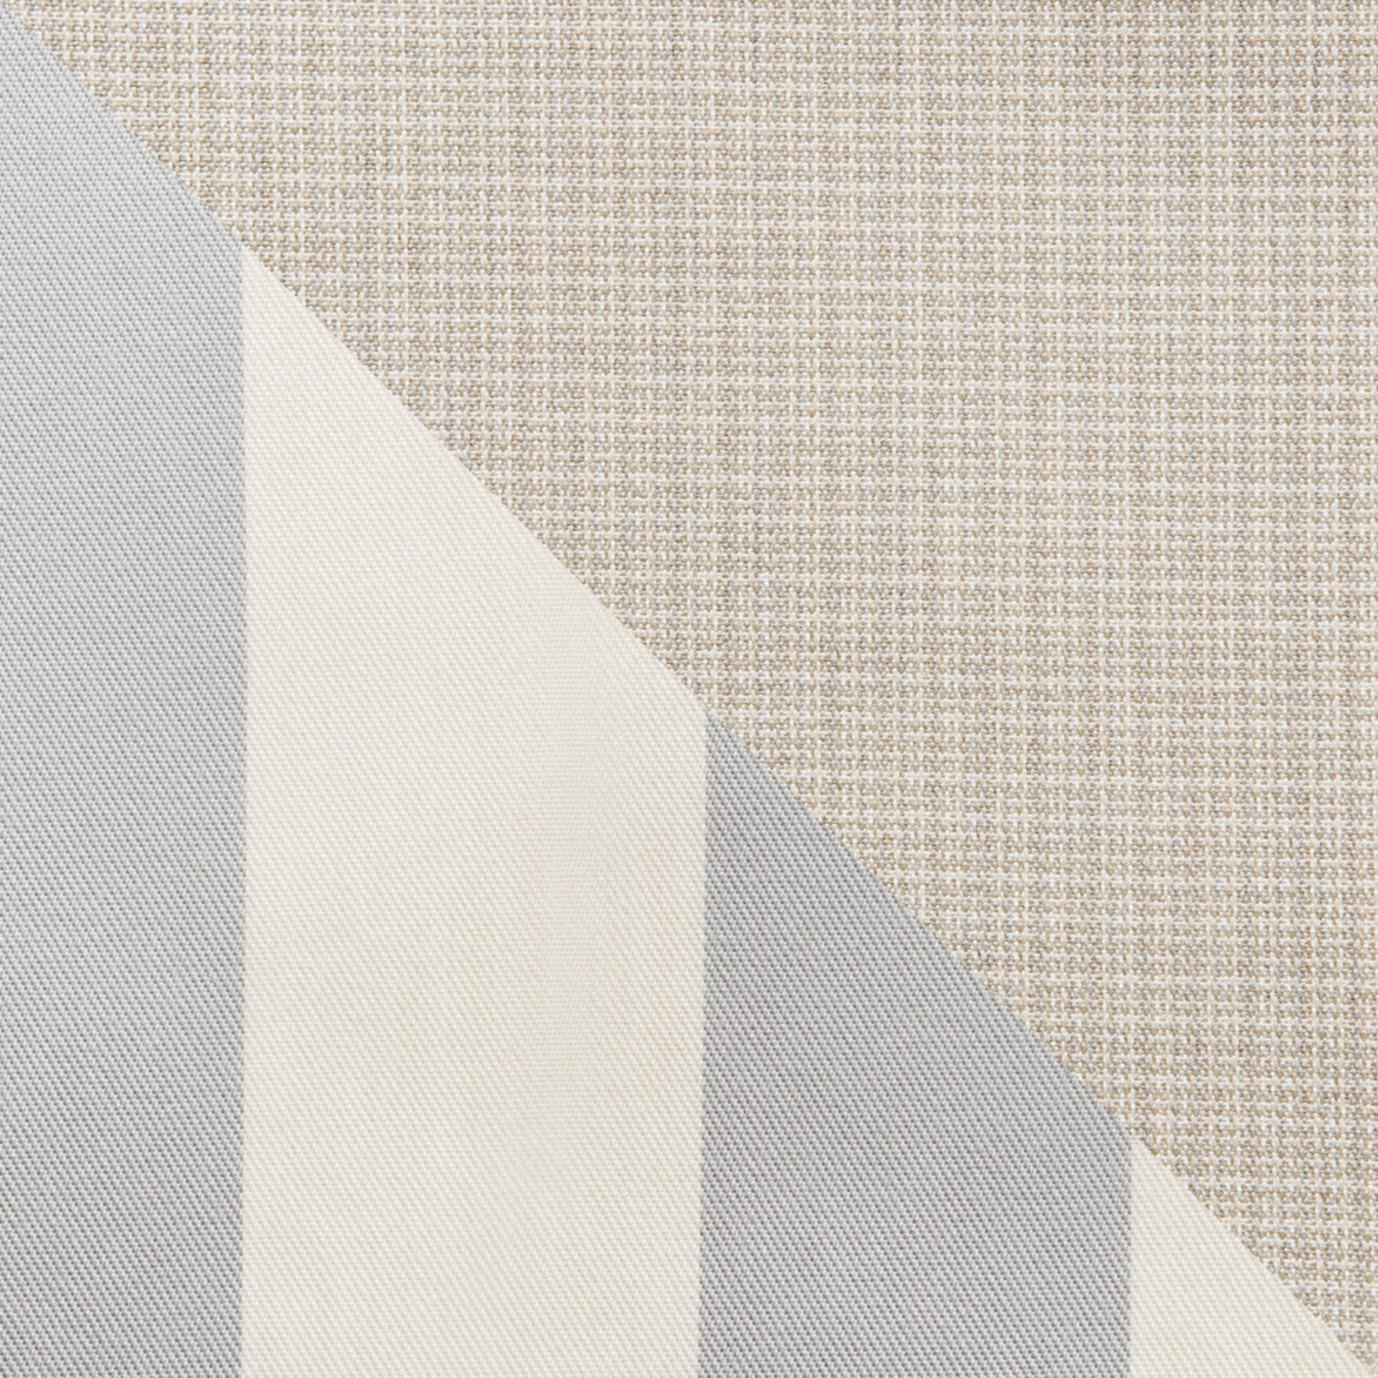 Deco 5pc Motion Club & Ottoman Set - Slate Gray